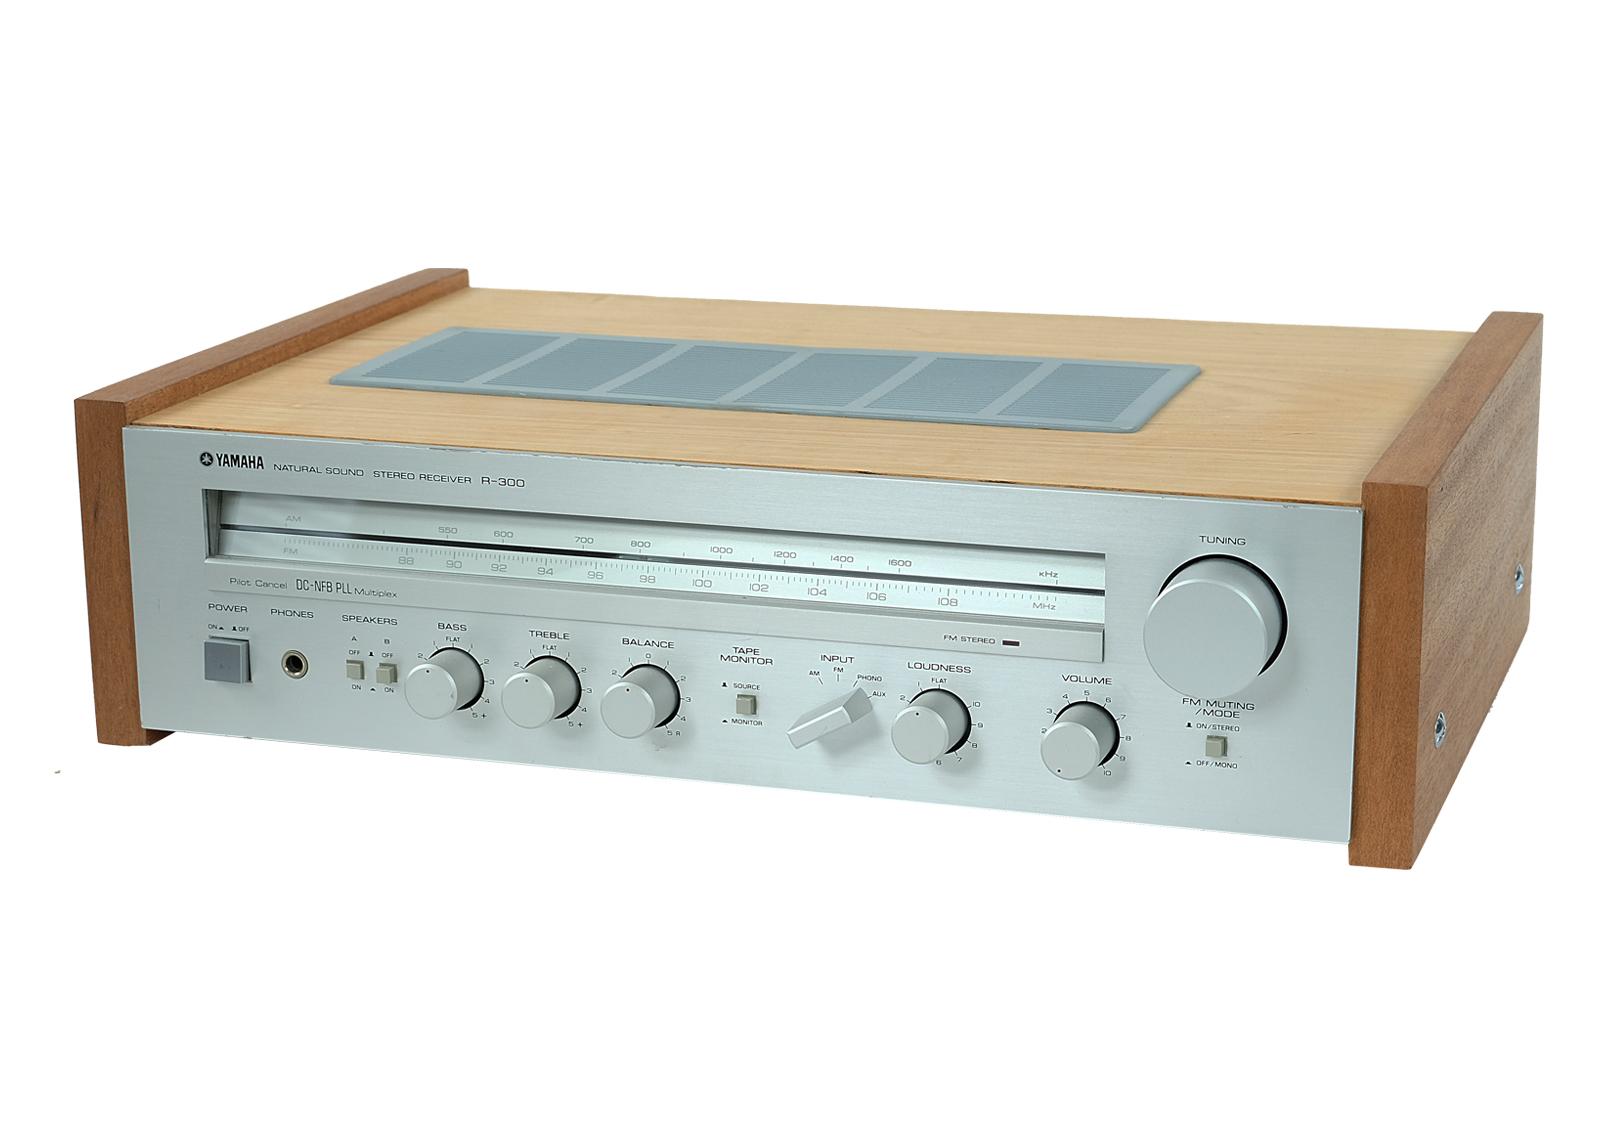 yamaha r 300 stereo receiver natural sound stereo. Black Bedroom Furniture Sets. Home Design Ideas